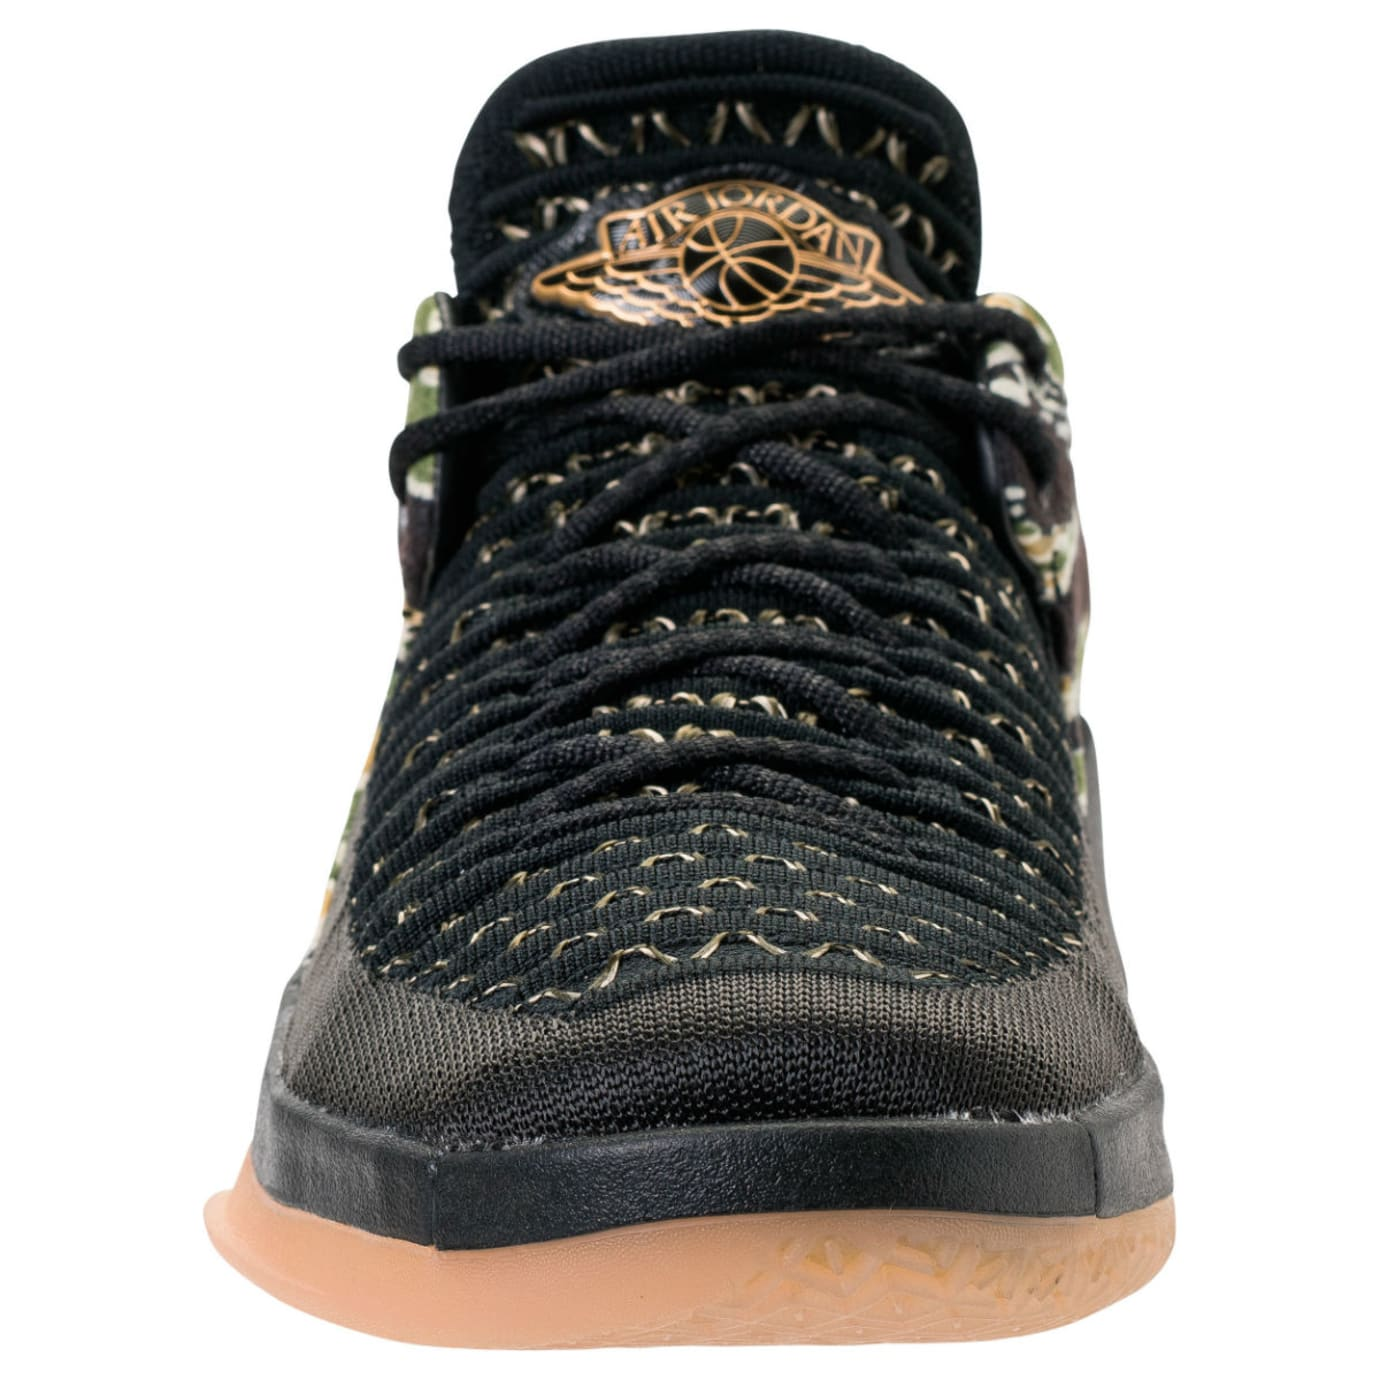 low priced a5c67 c63a0 Air Jordan 32 Low Kids Camo Release Date AA1257-021 | Sole ...